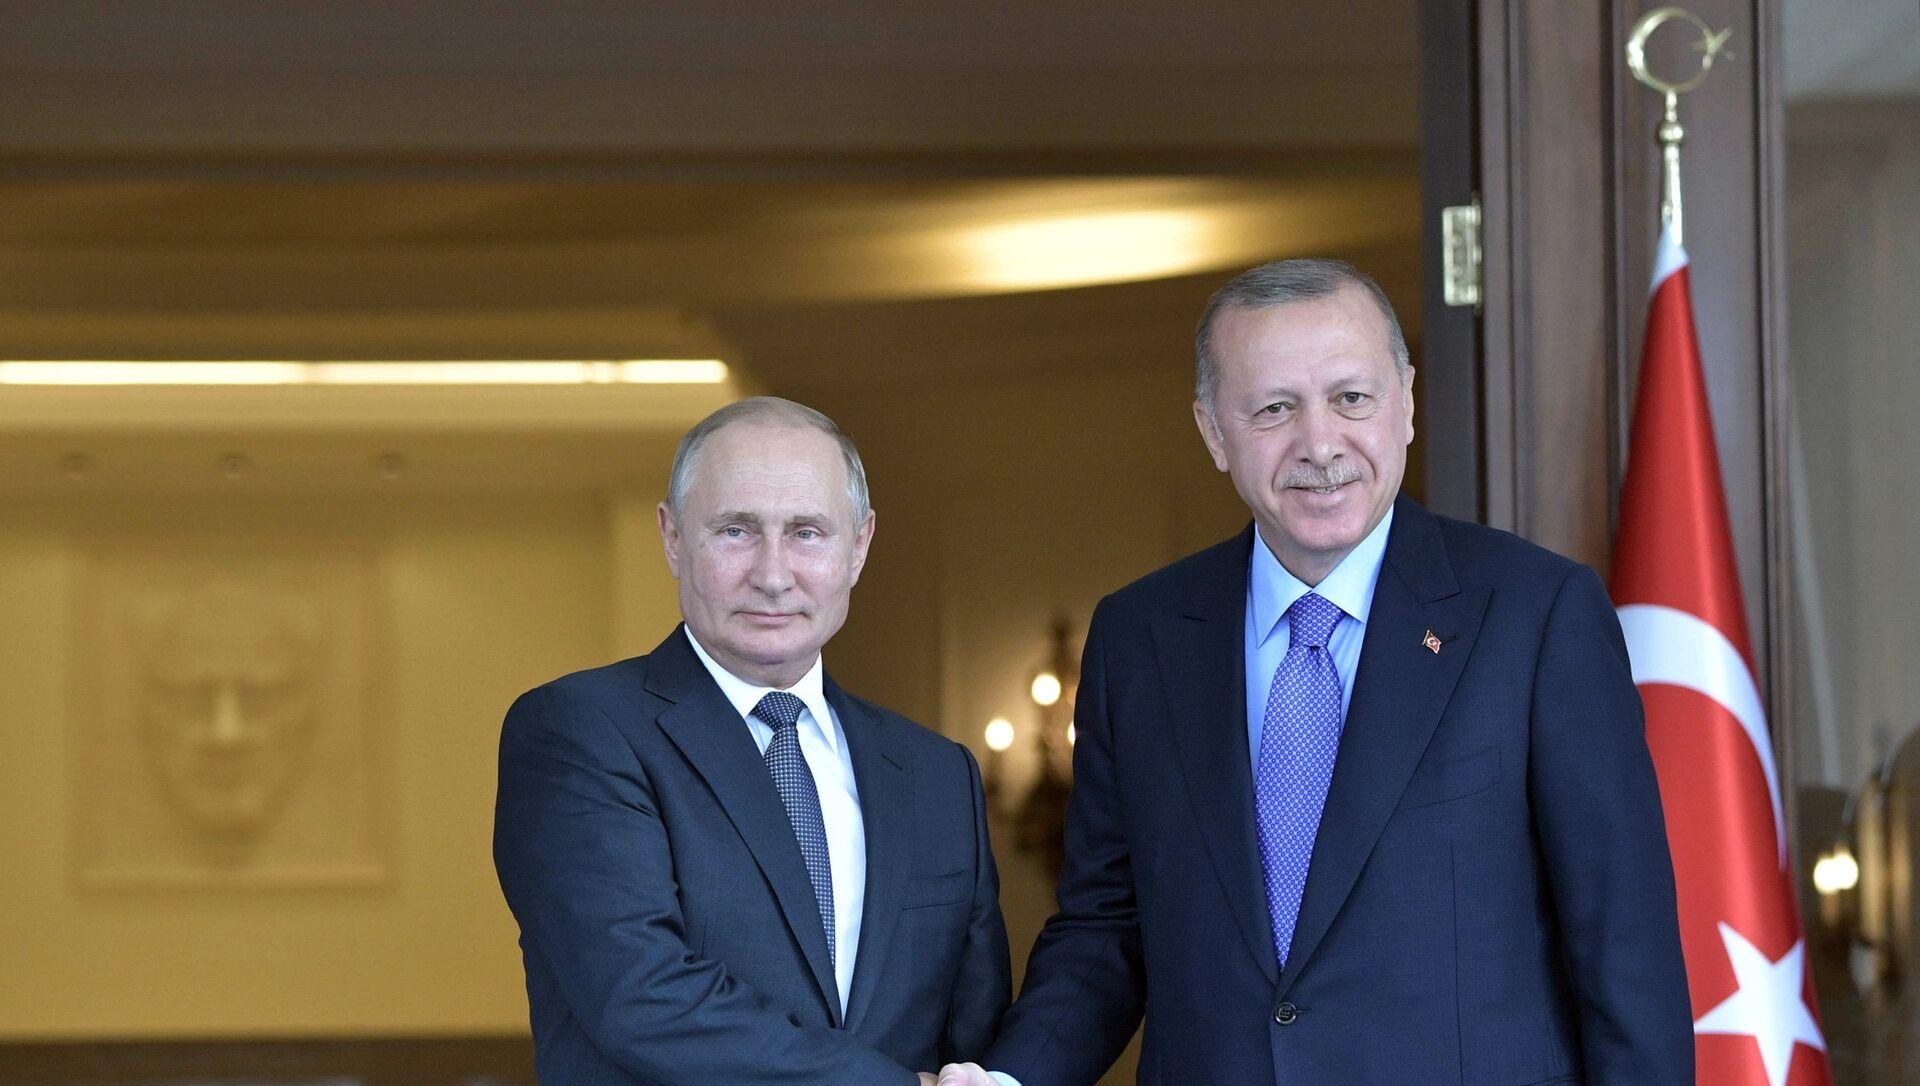 Президент РФ Владимир Путин и президент Турции Реджеп Тайип Эрдоган во время встречи, фото из архива - Sputnik Азербайджан, 1920, 17.06.2021